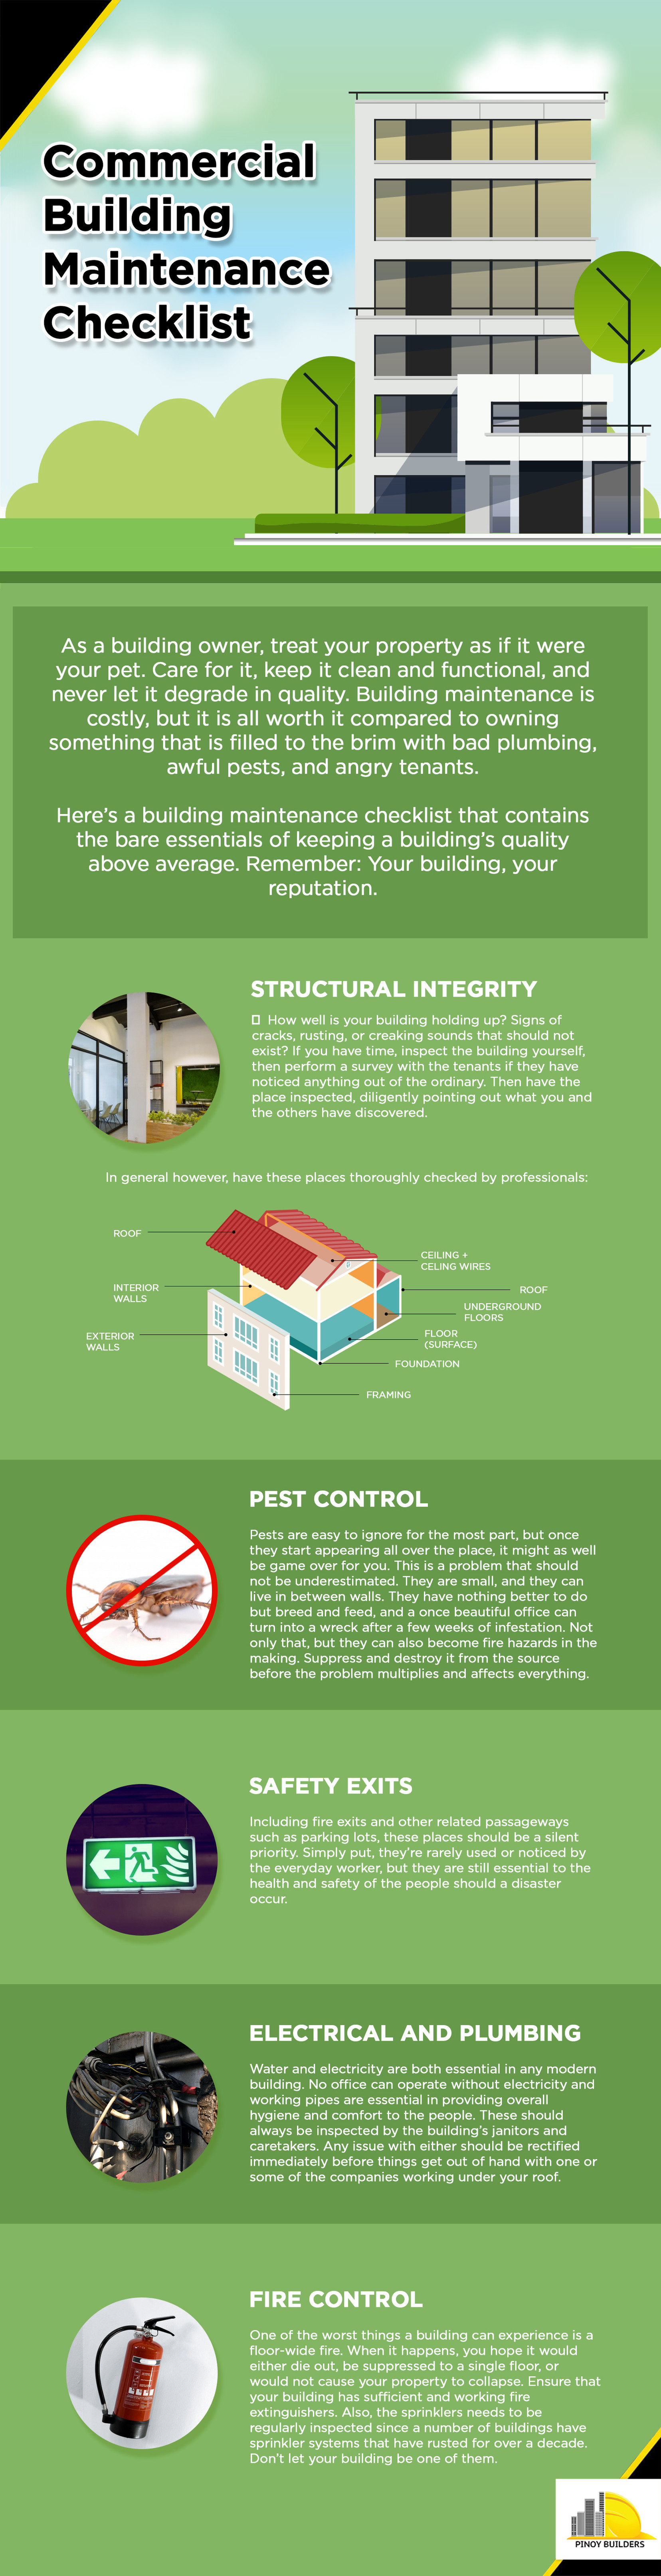 Infographics -Commercial Building Maintenance Checklist.jpg